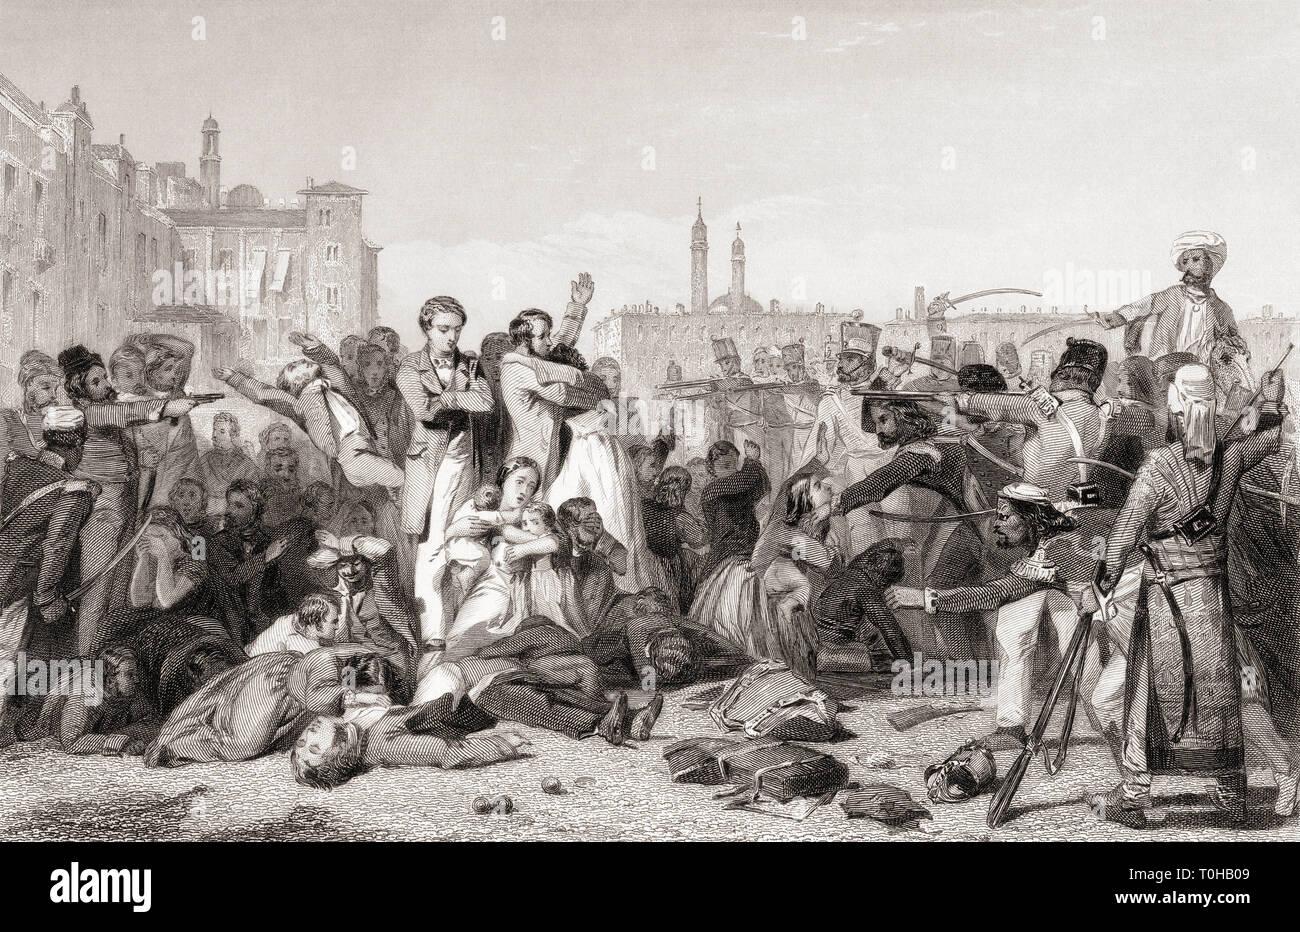 Massacre at Cawnpore, Kanpur, Uttar Pradesh, India, Asia, 1857 Stock Photo